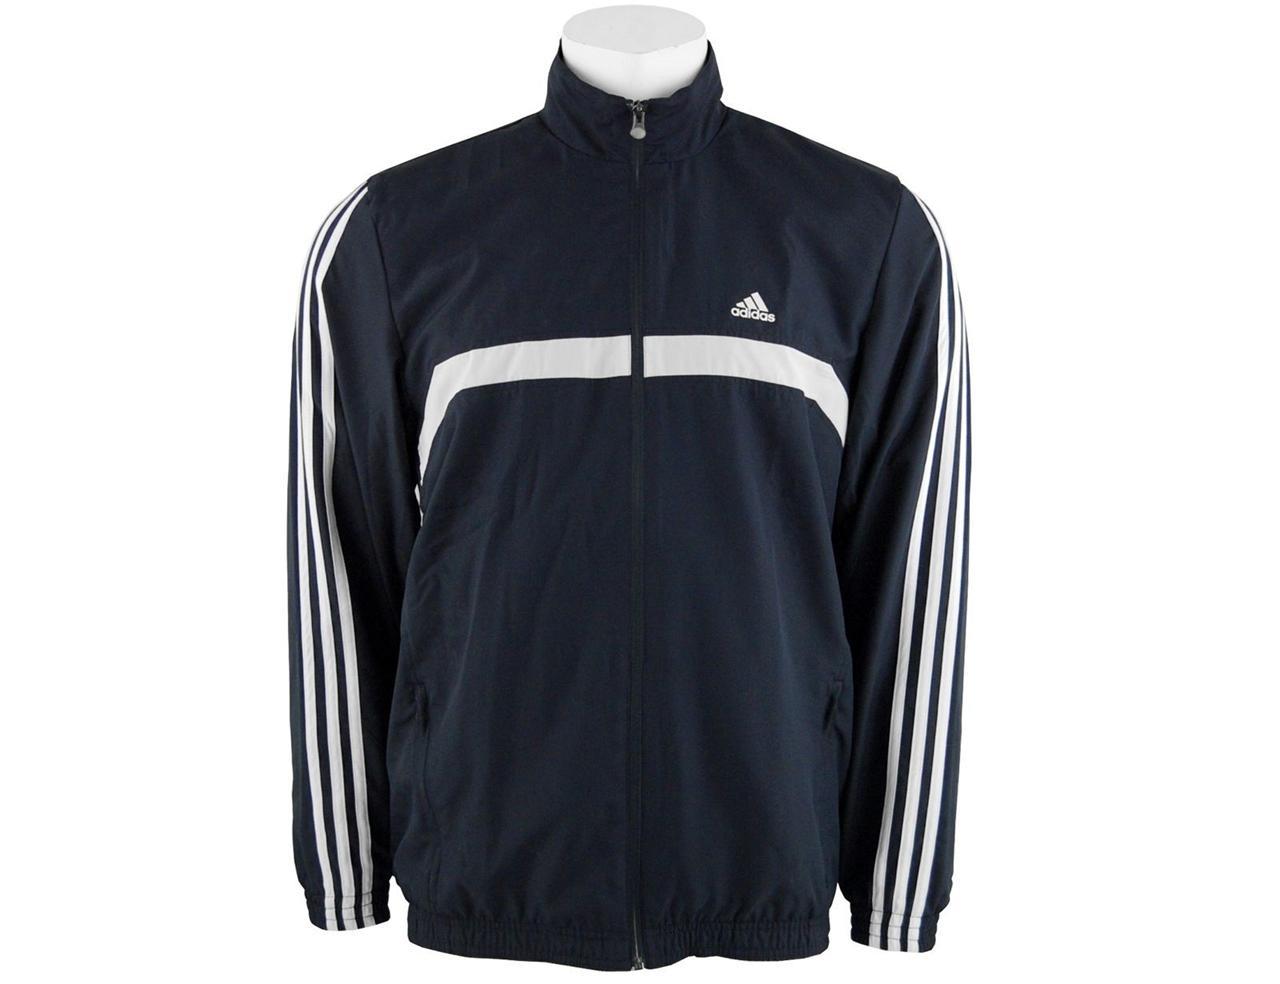 Adidas-Mens-Jacket-ClimaCool-Track-Top-Tennis-Training-Top-Size-M-XXL-BNWT